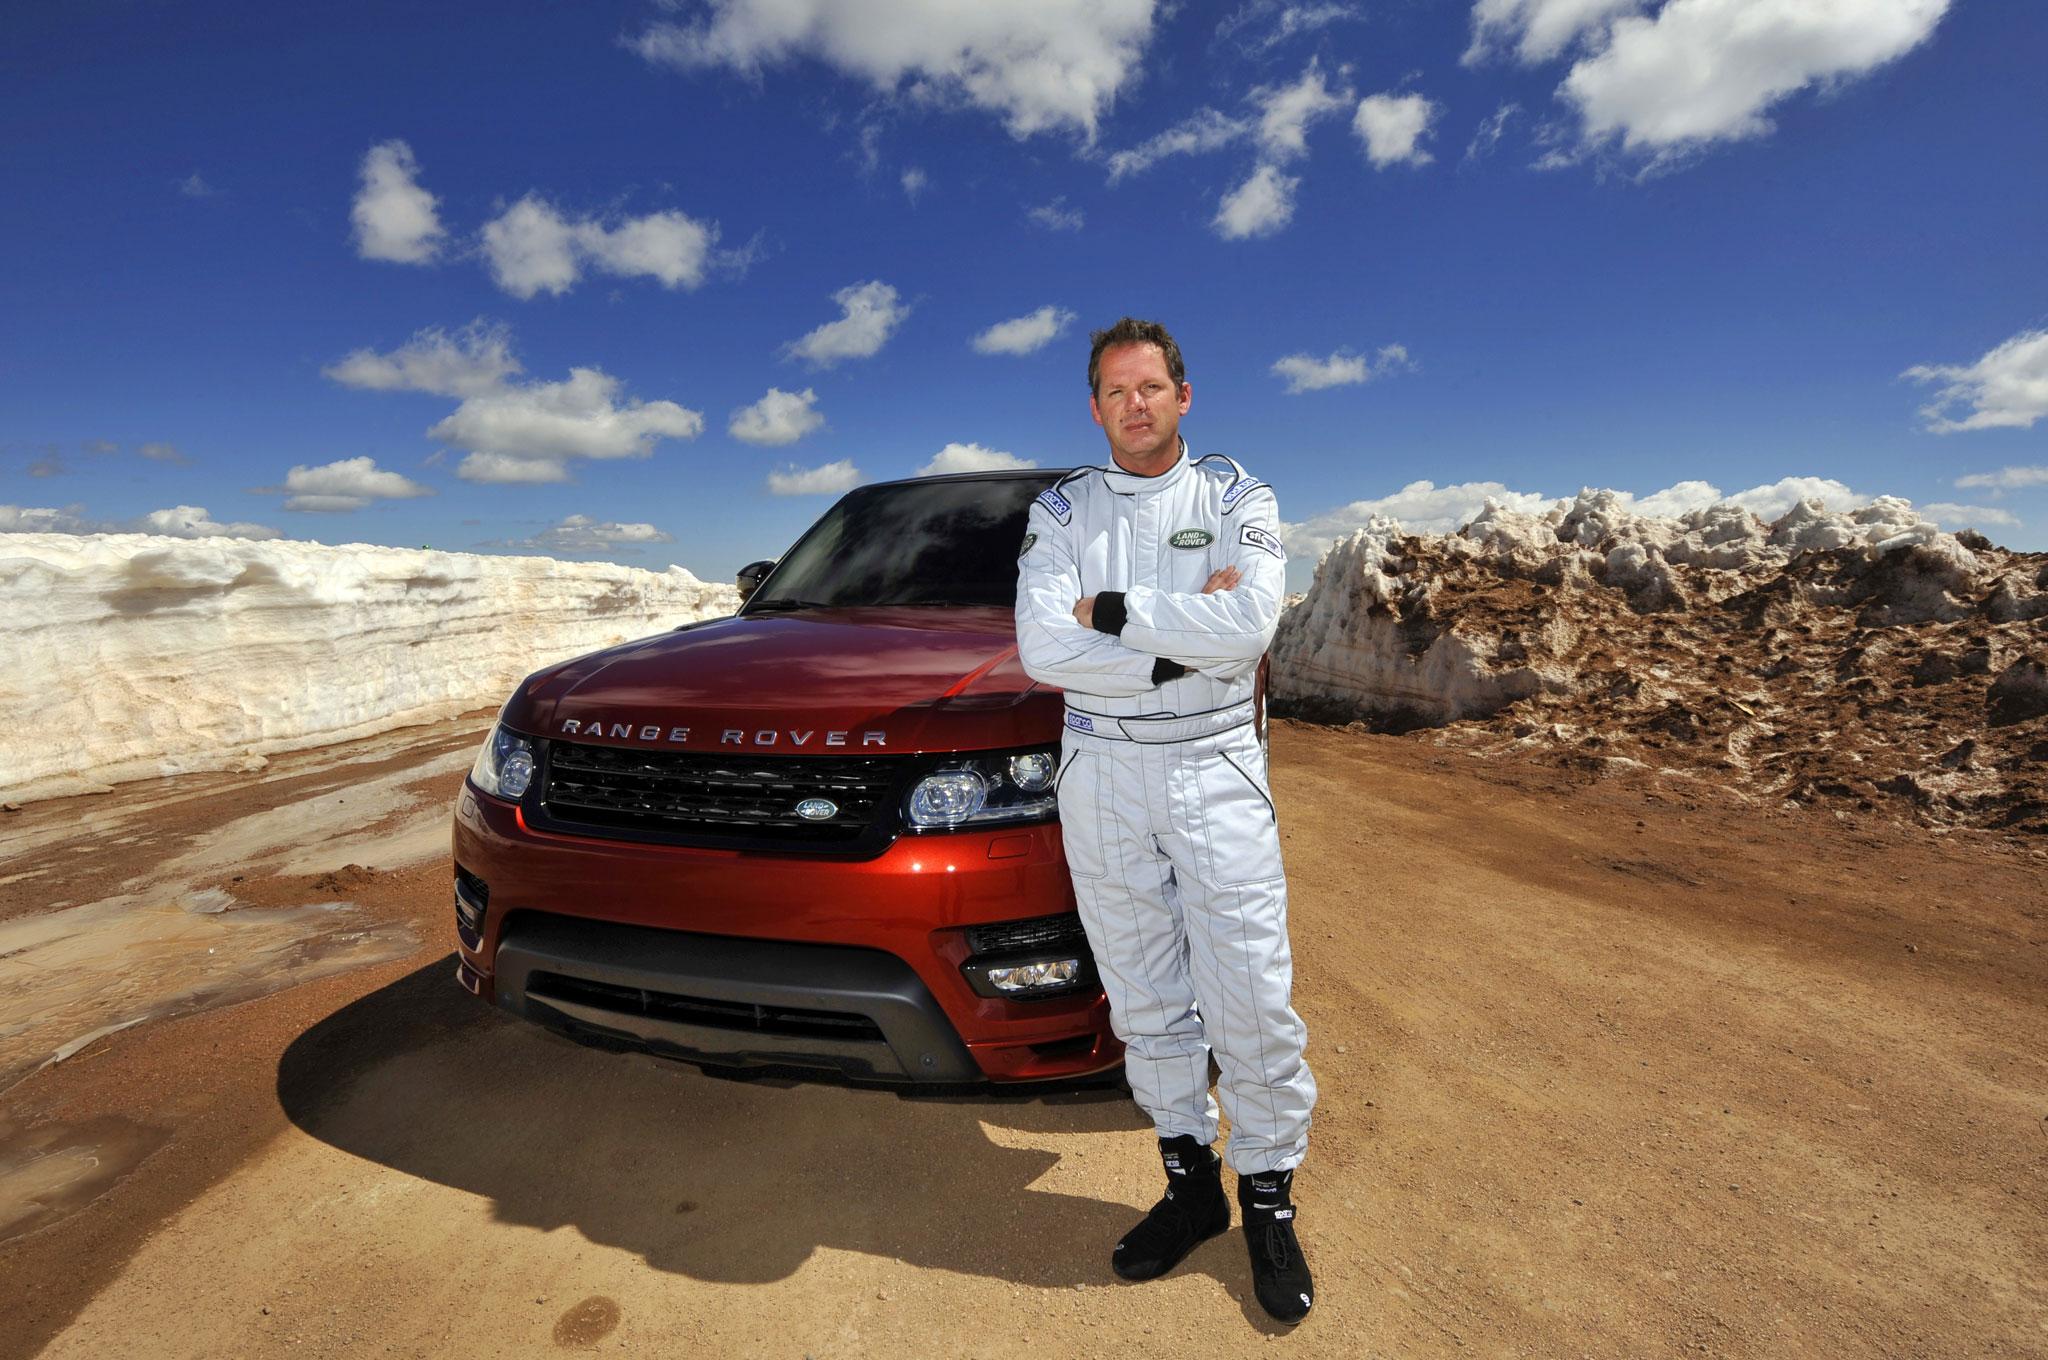 2014 Range Rover Sport Paul Dallenbach1